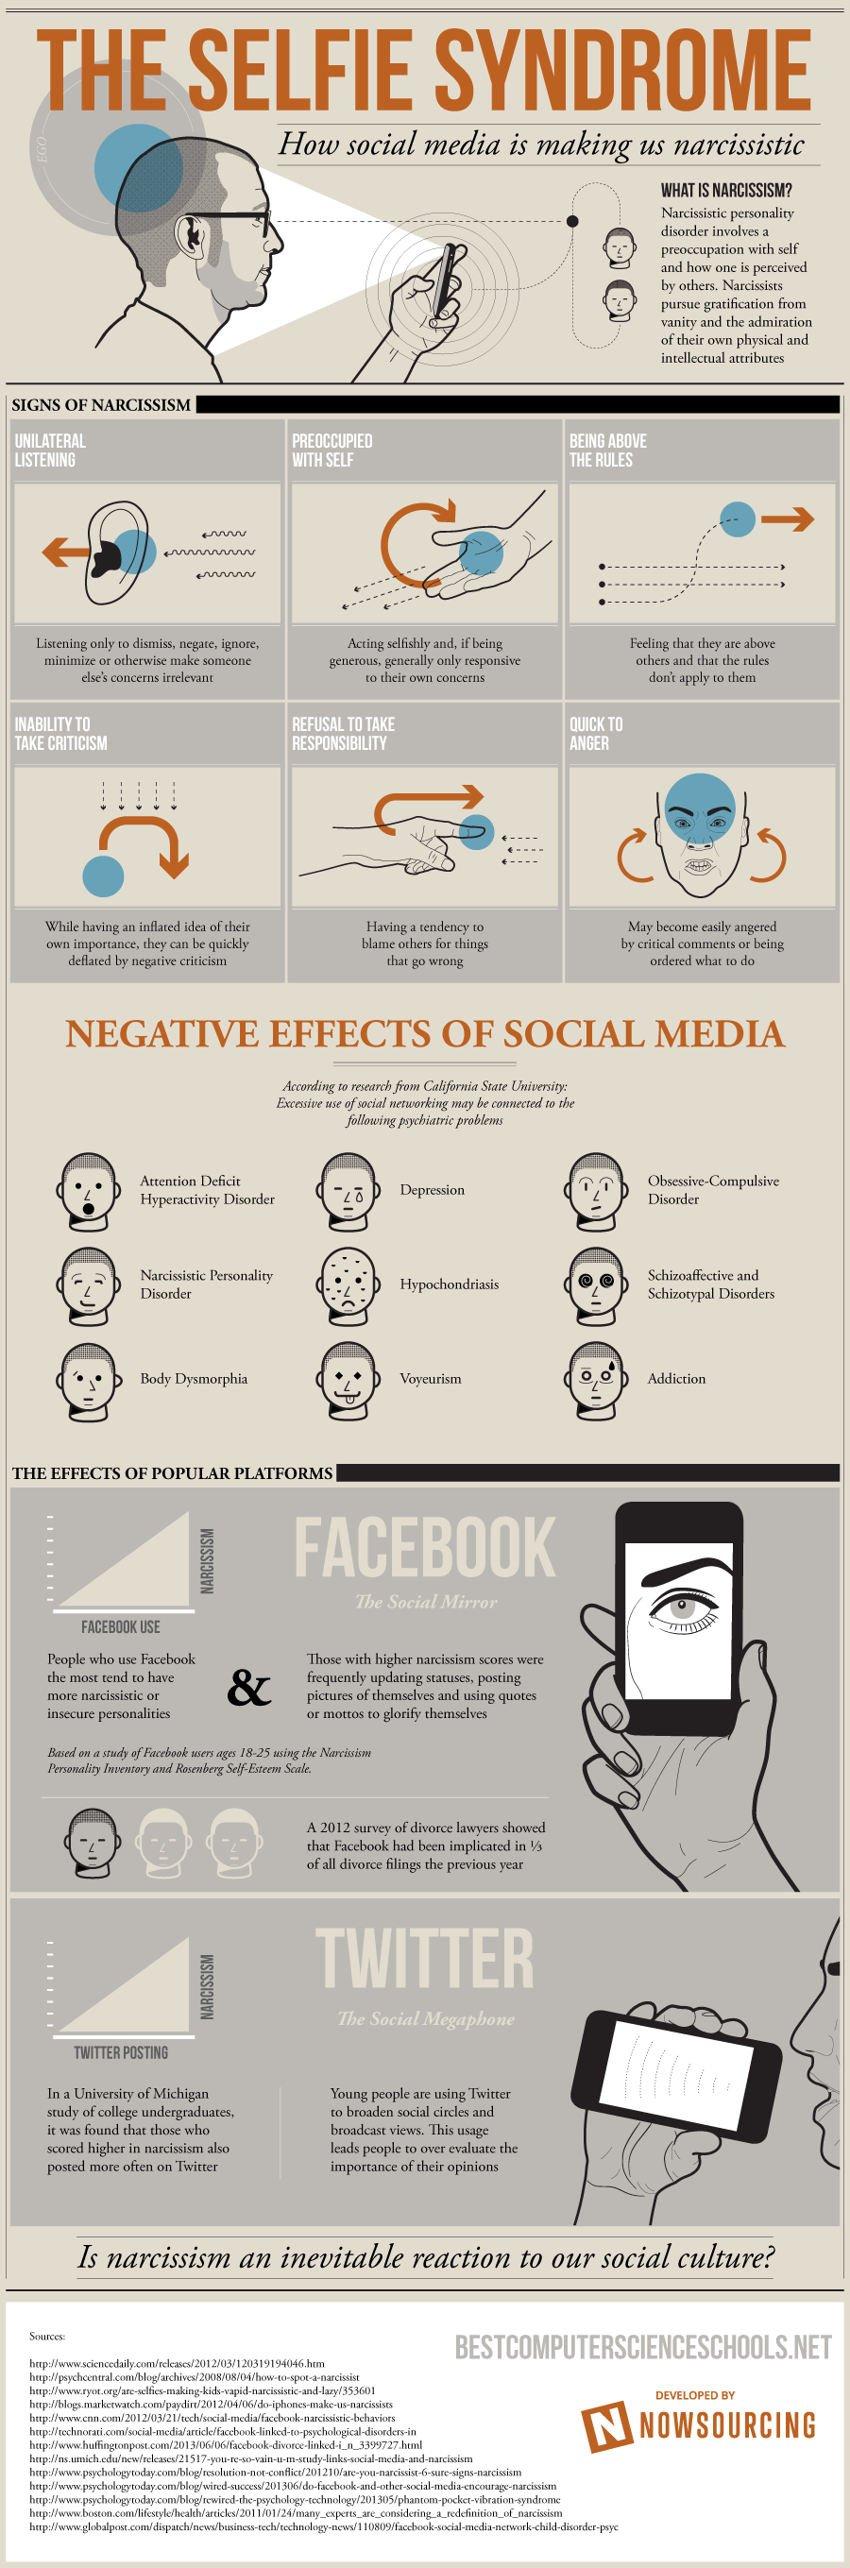 social media narcissism selfies syndrome